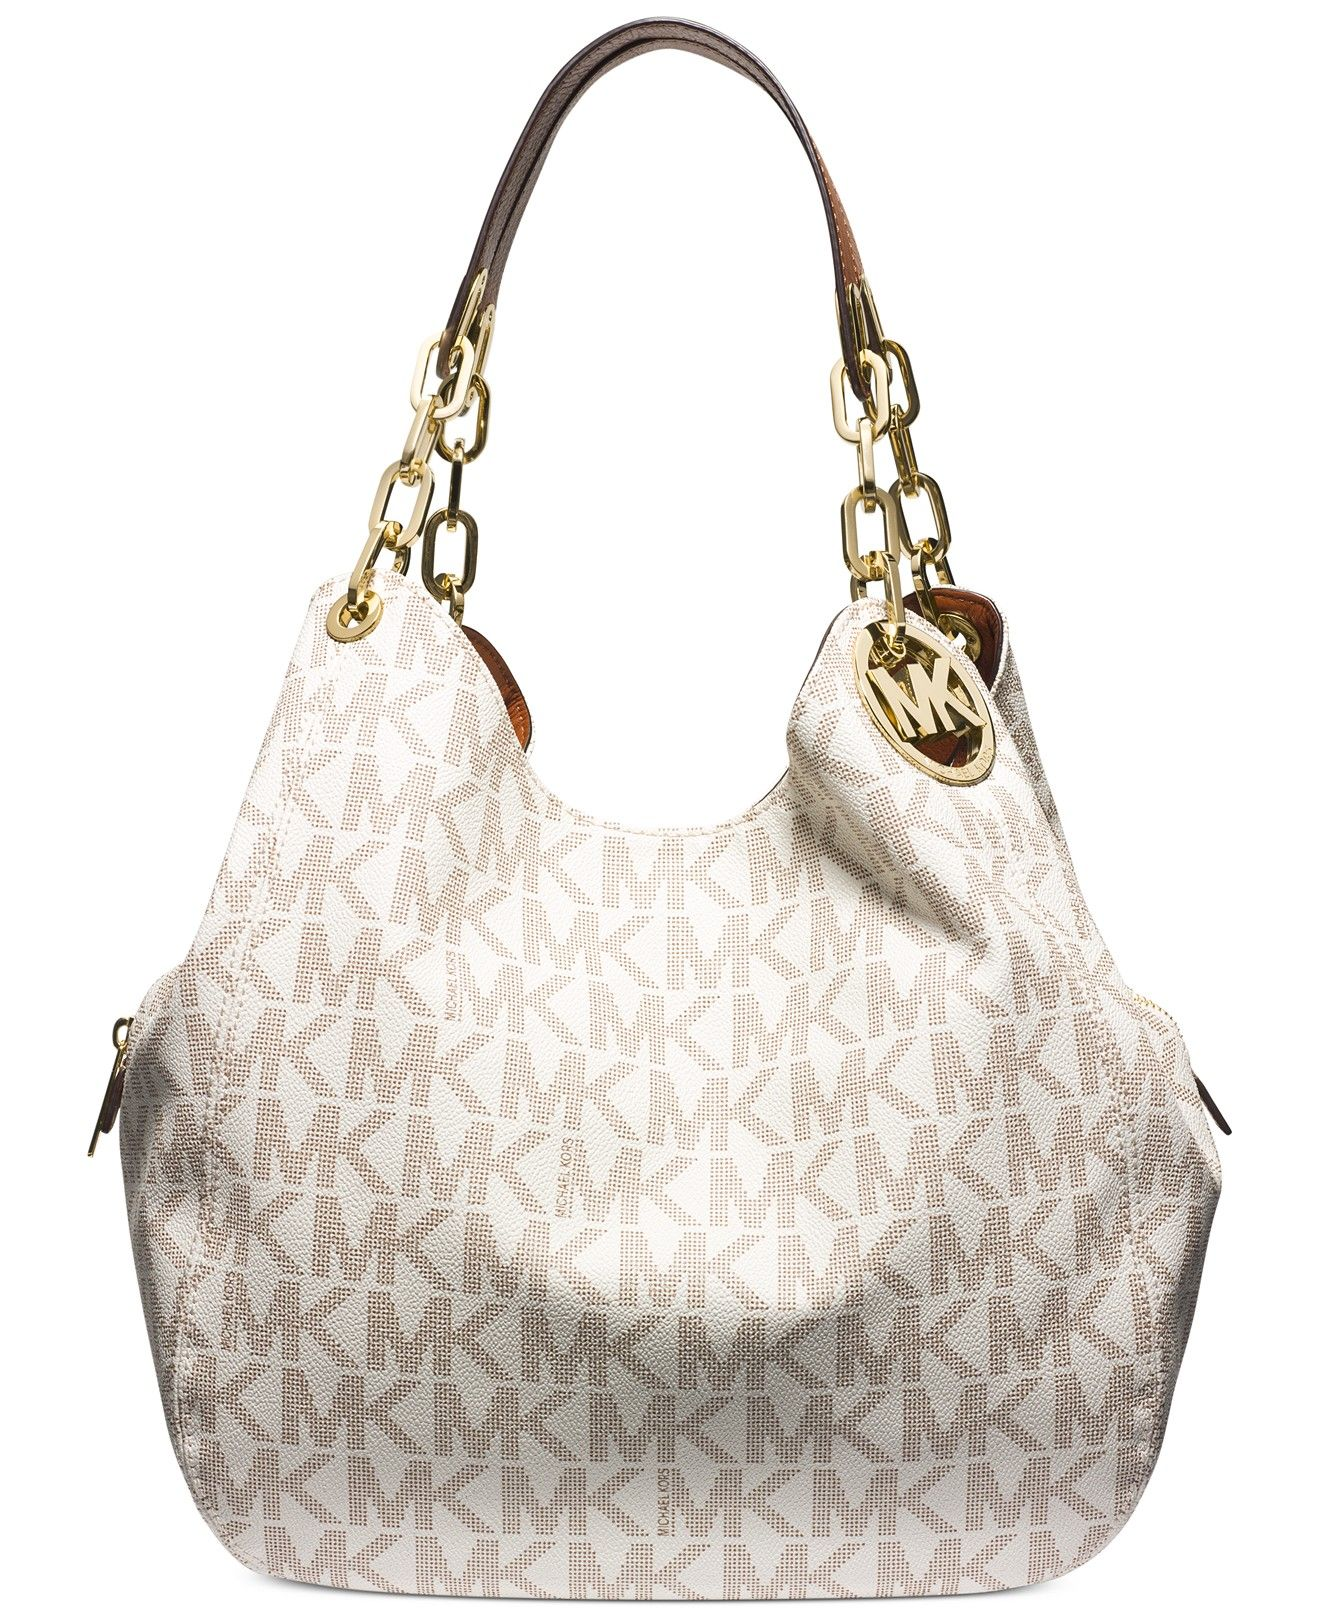 82cd658e5f88 MICHAEL Michael Kors Fulton Large Shoulder Tote - Handbags Accessories -  Macys